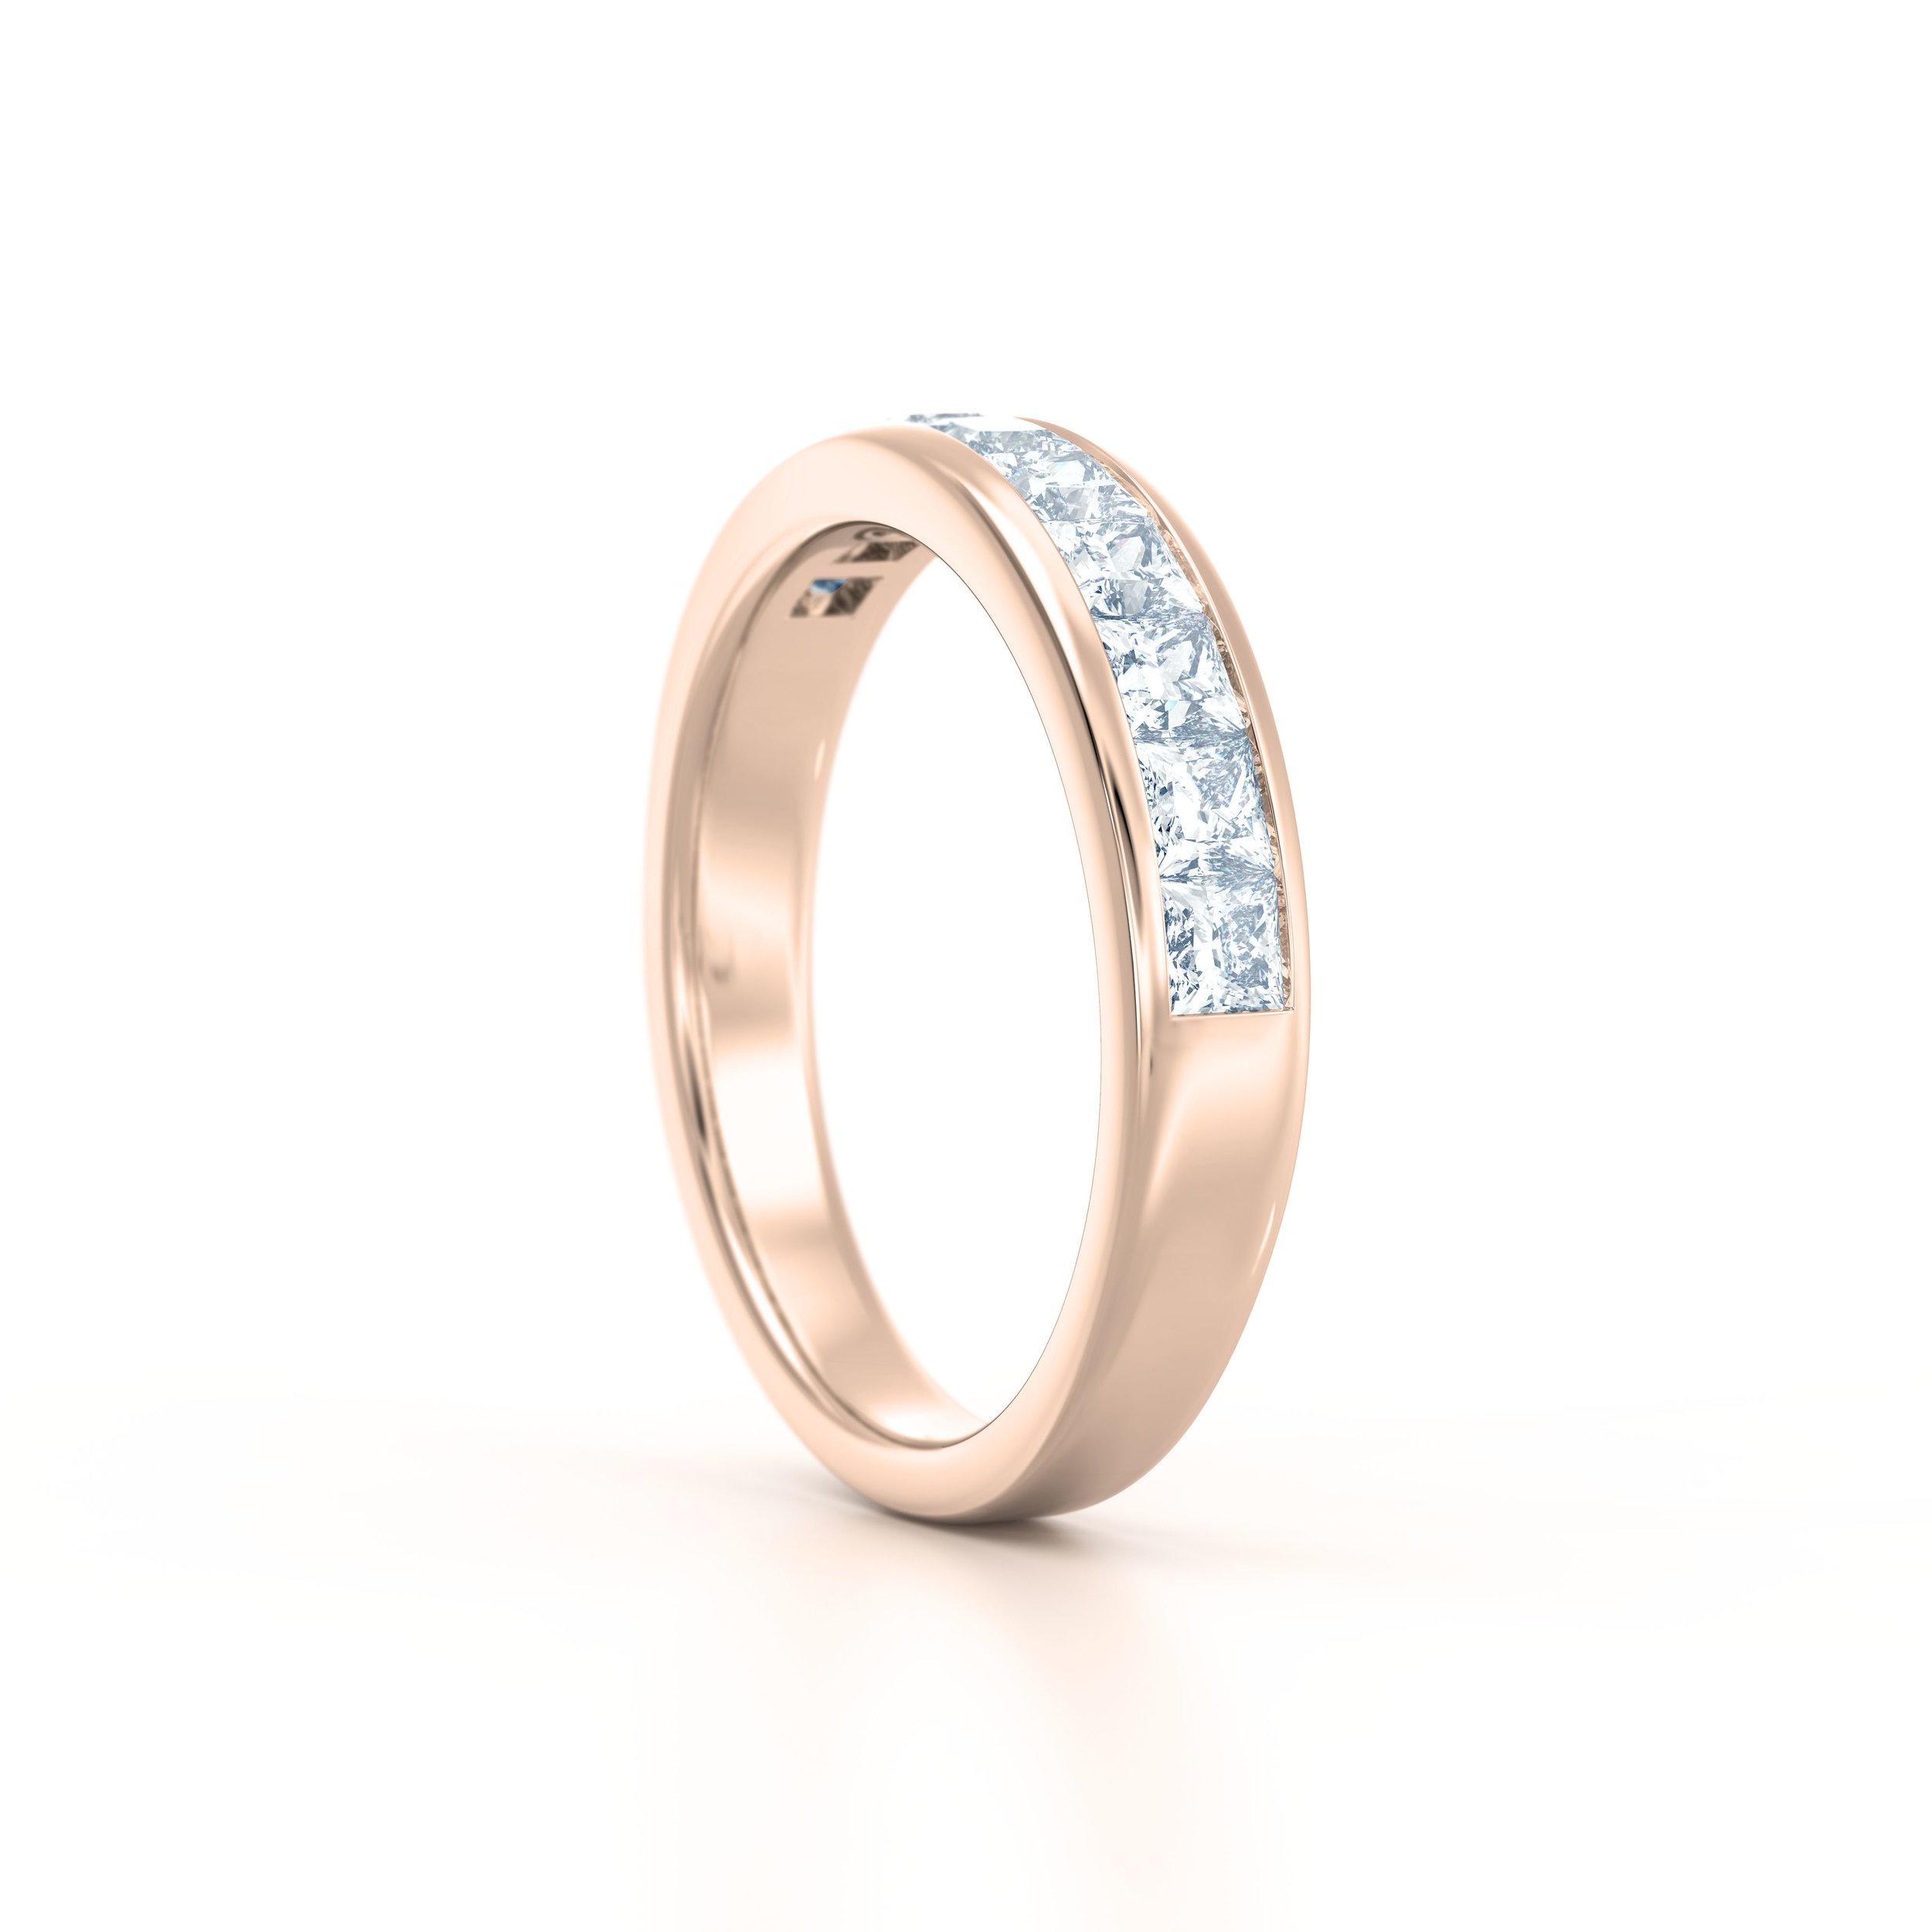 Channel set princess cut eternity ring | Hatton Garden